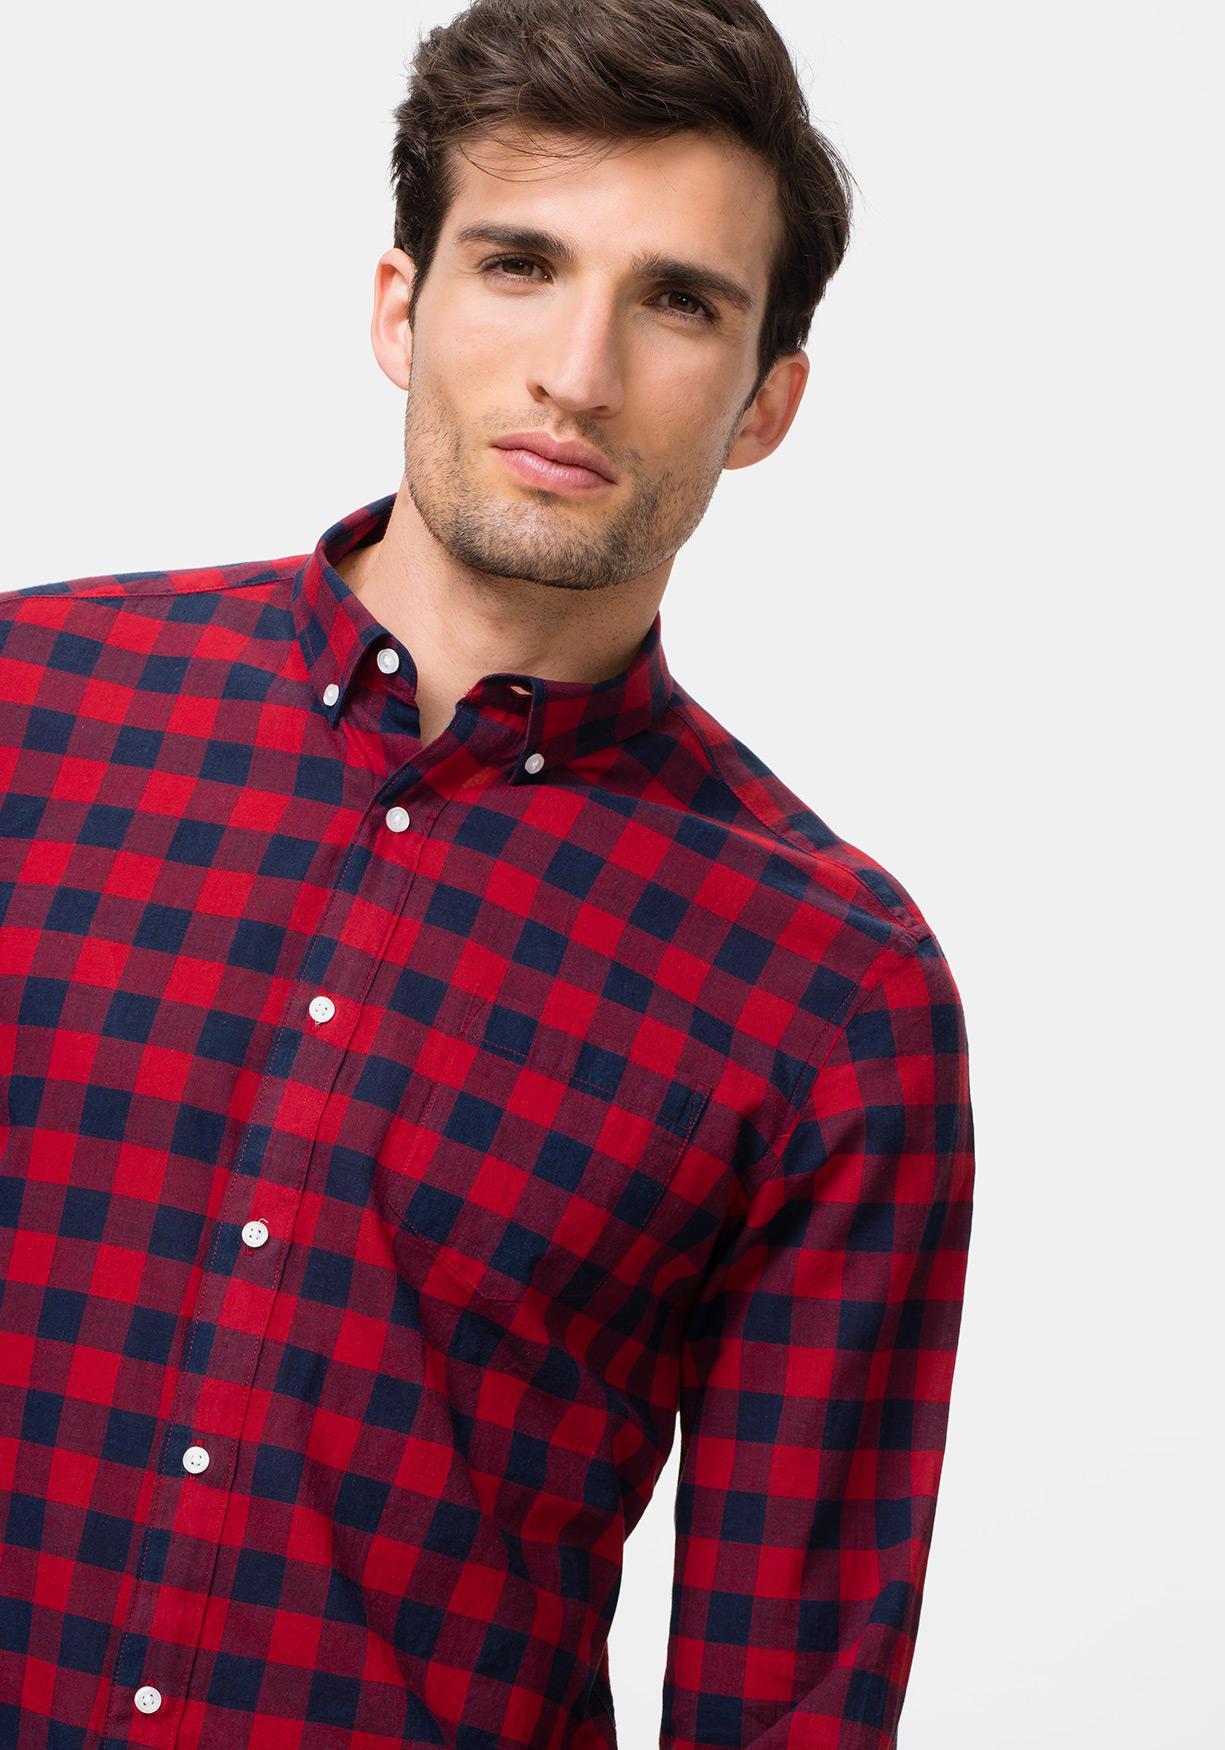 8520eecd463 Comprar Camisa de manga larga de cuadros TEX. ¡Aprovéchate de ...